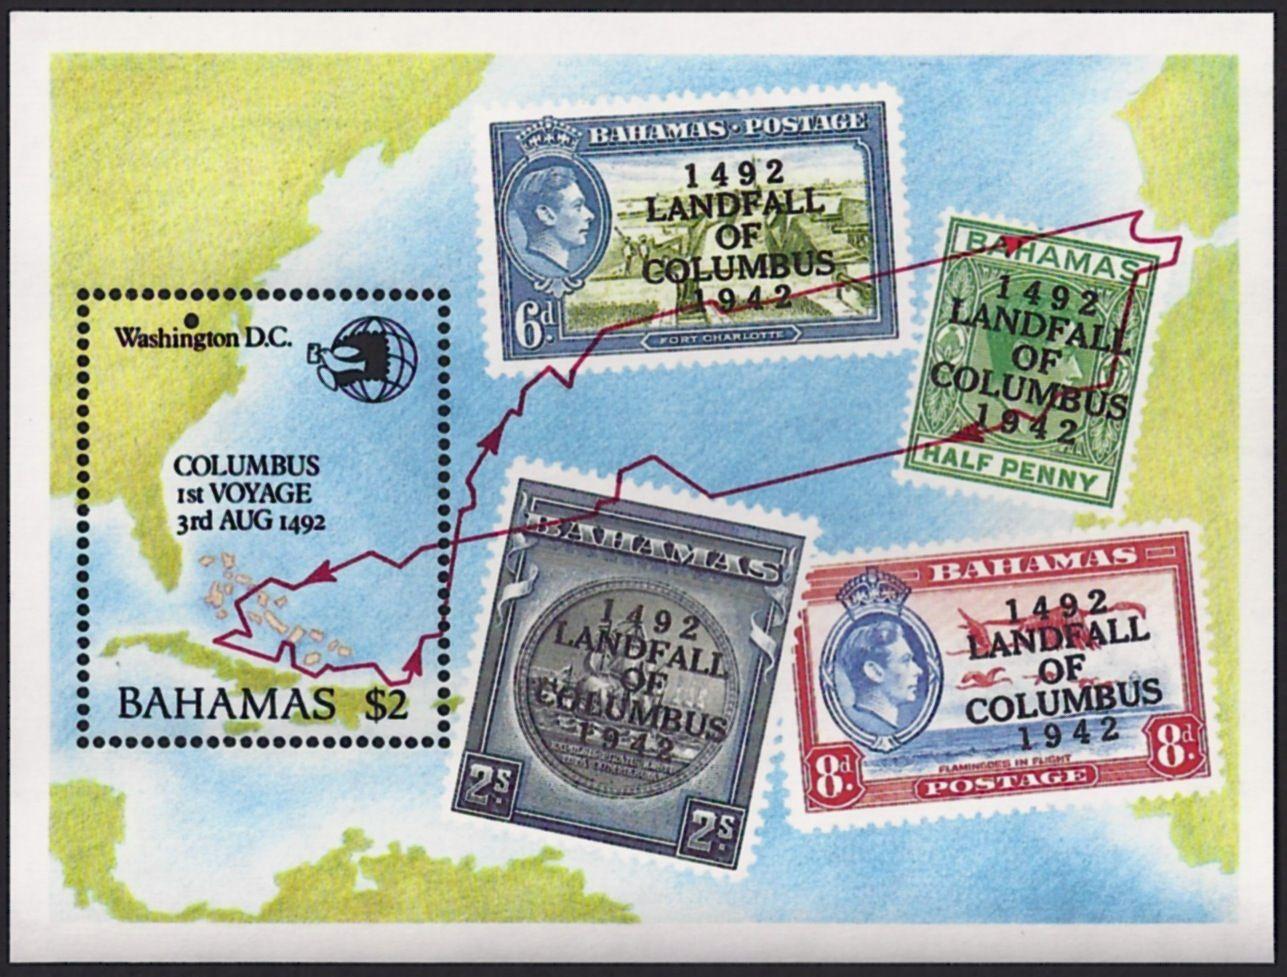 Bahamas Scott 687 17 Nov Souvenir Sheet Showing